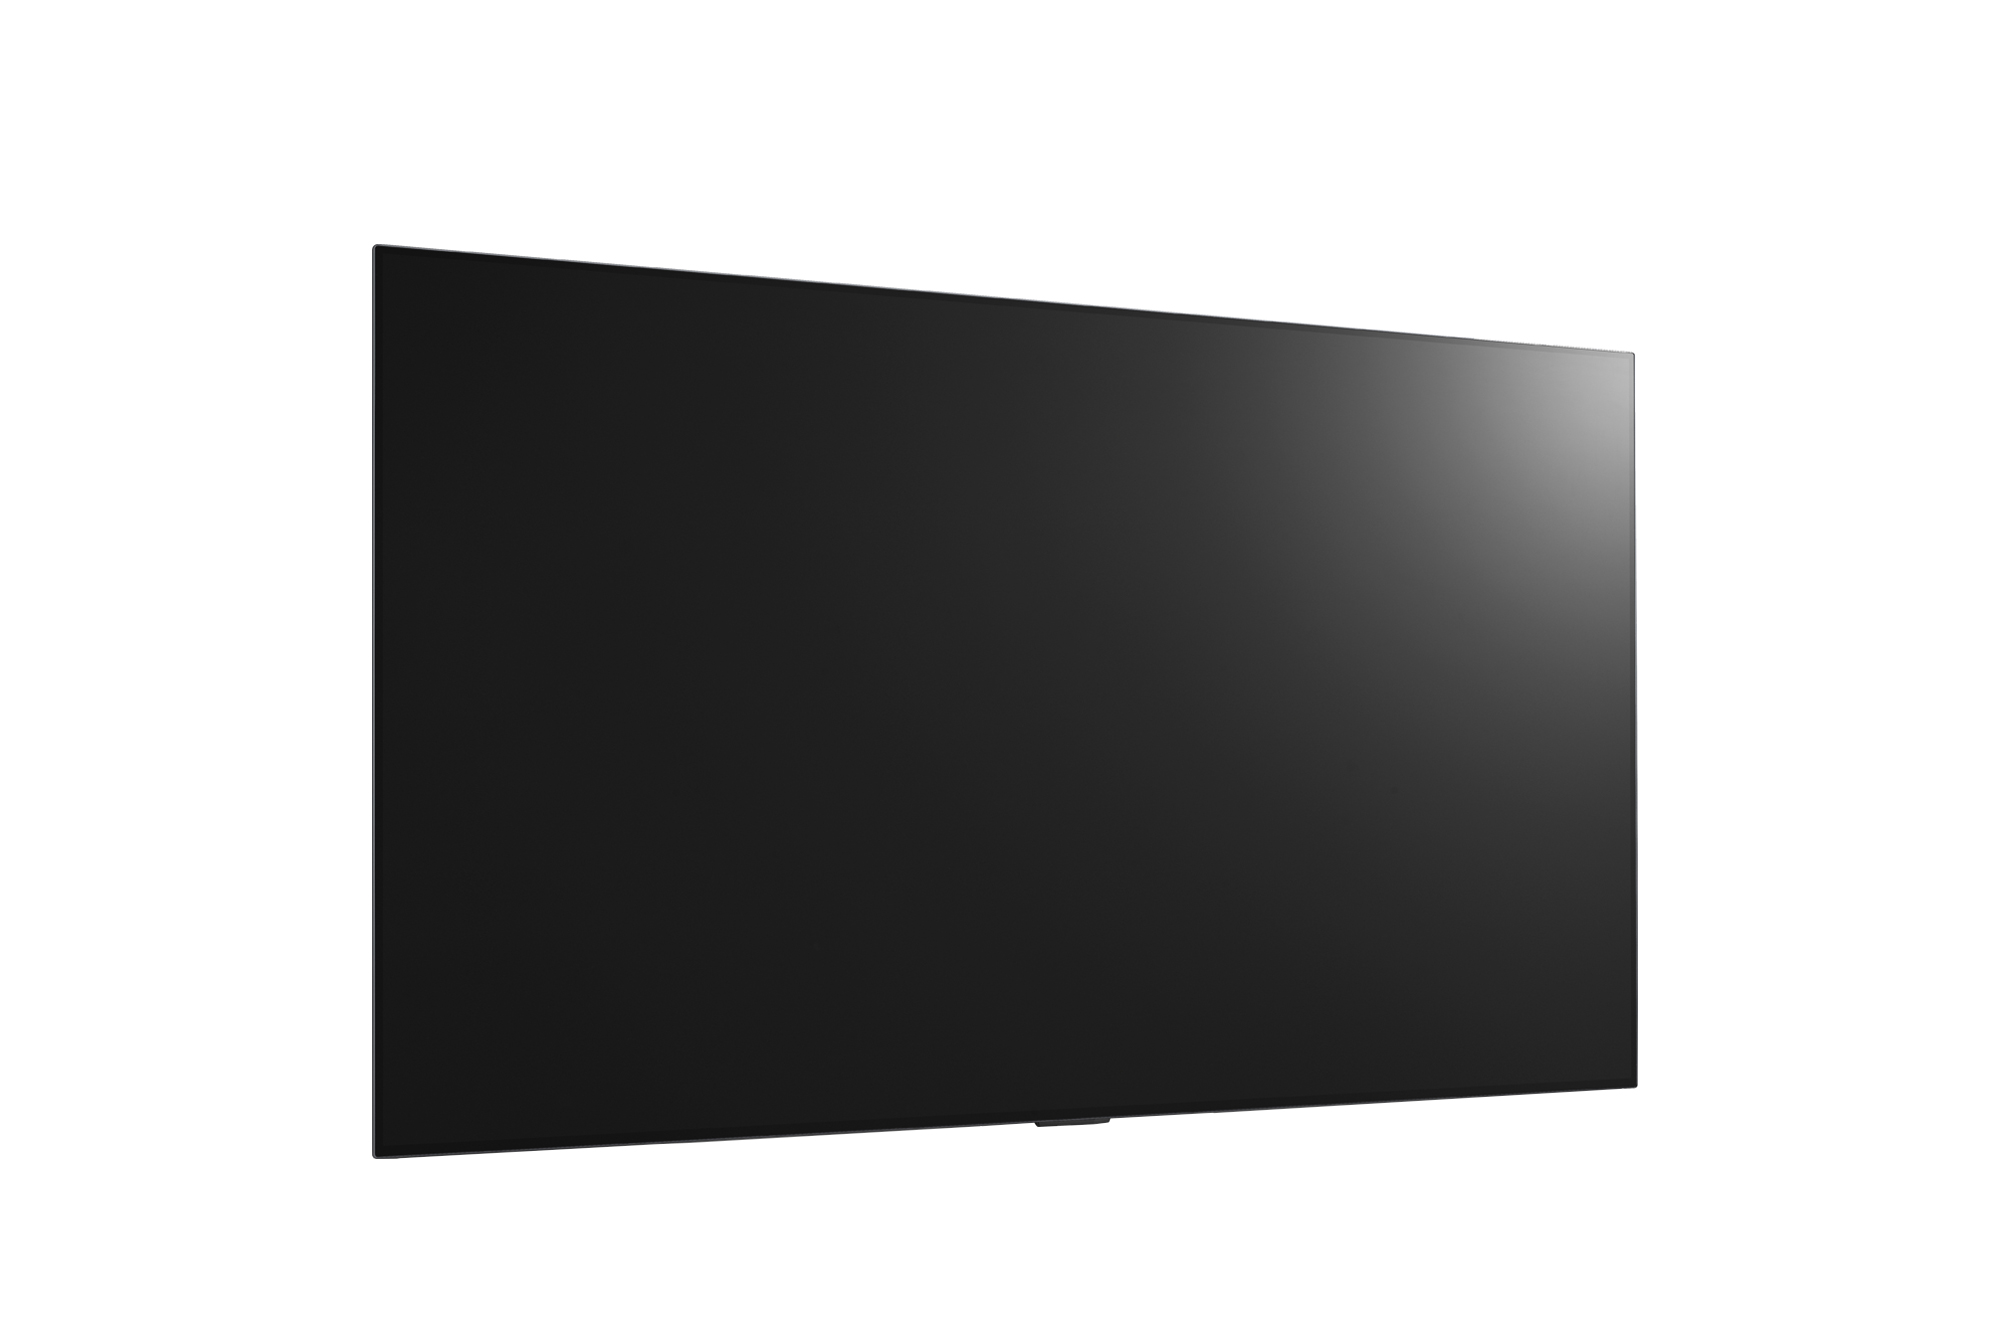 LG Pro:Centric SMART 65WS960H (EU) 6